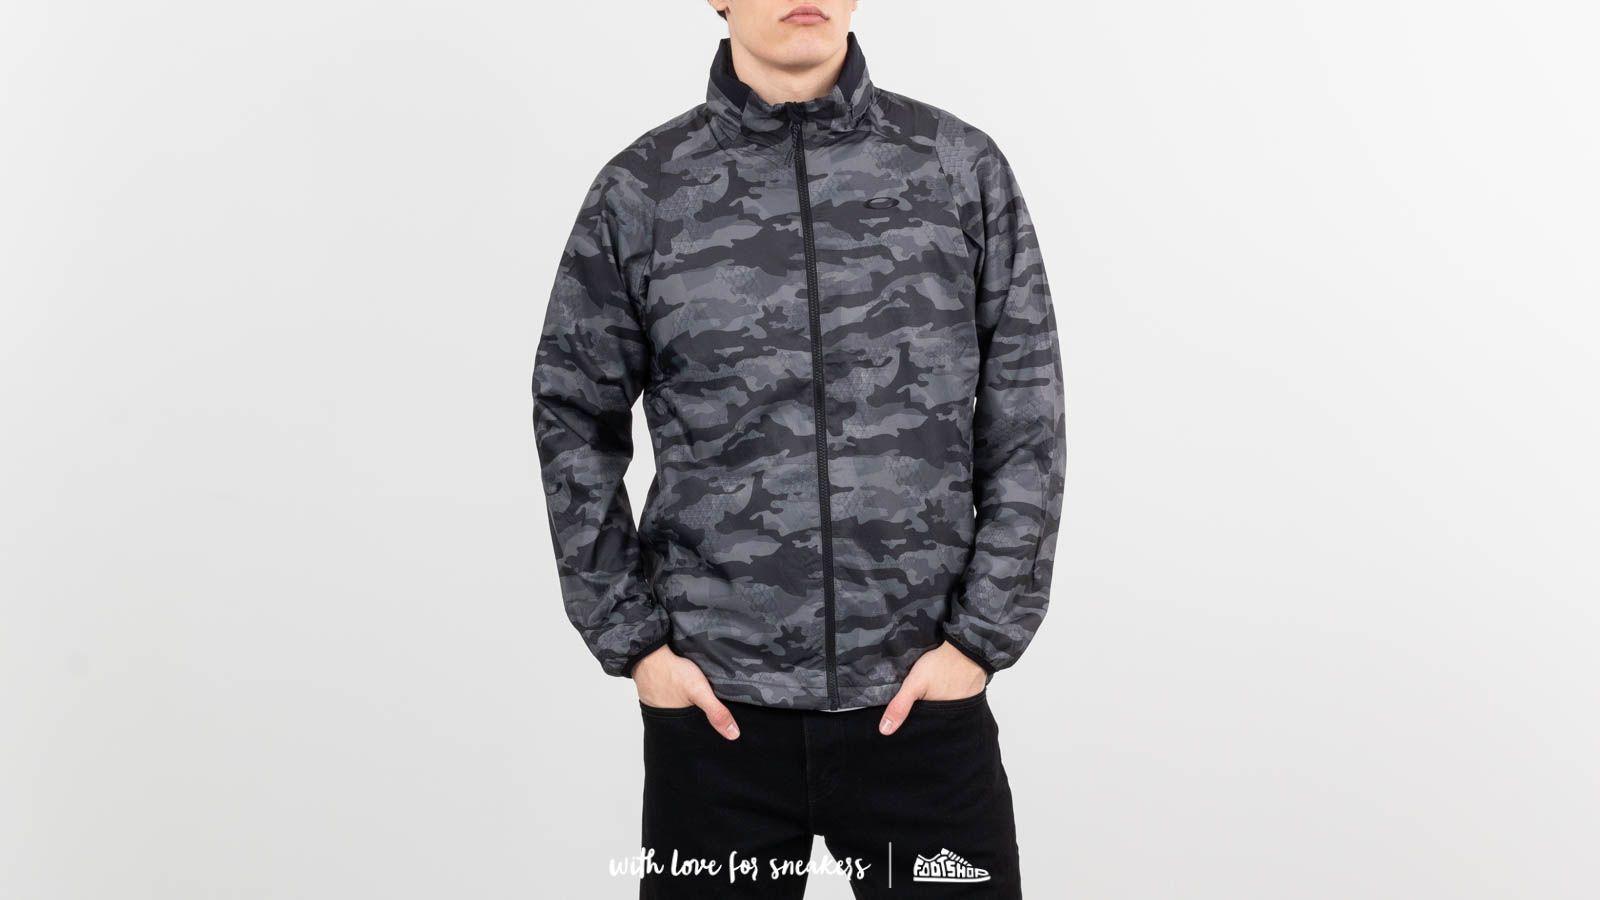 Bundy Oakley Enhance Graphic Wind Warm Jacket 8.7 Black Print